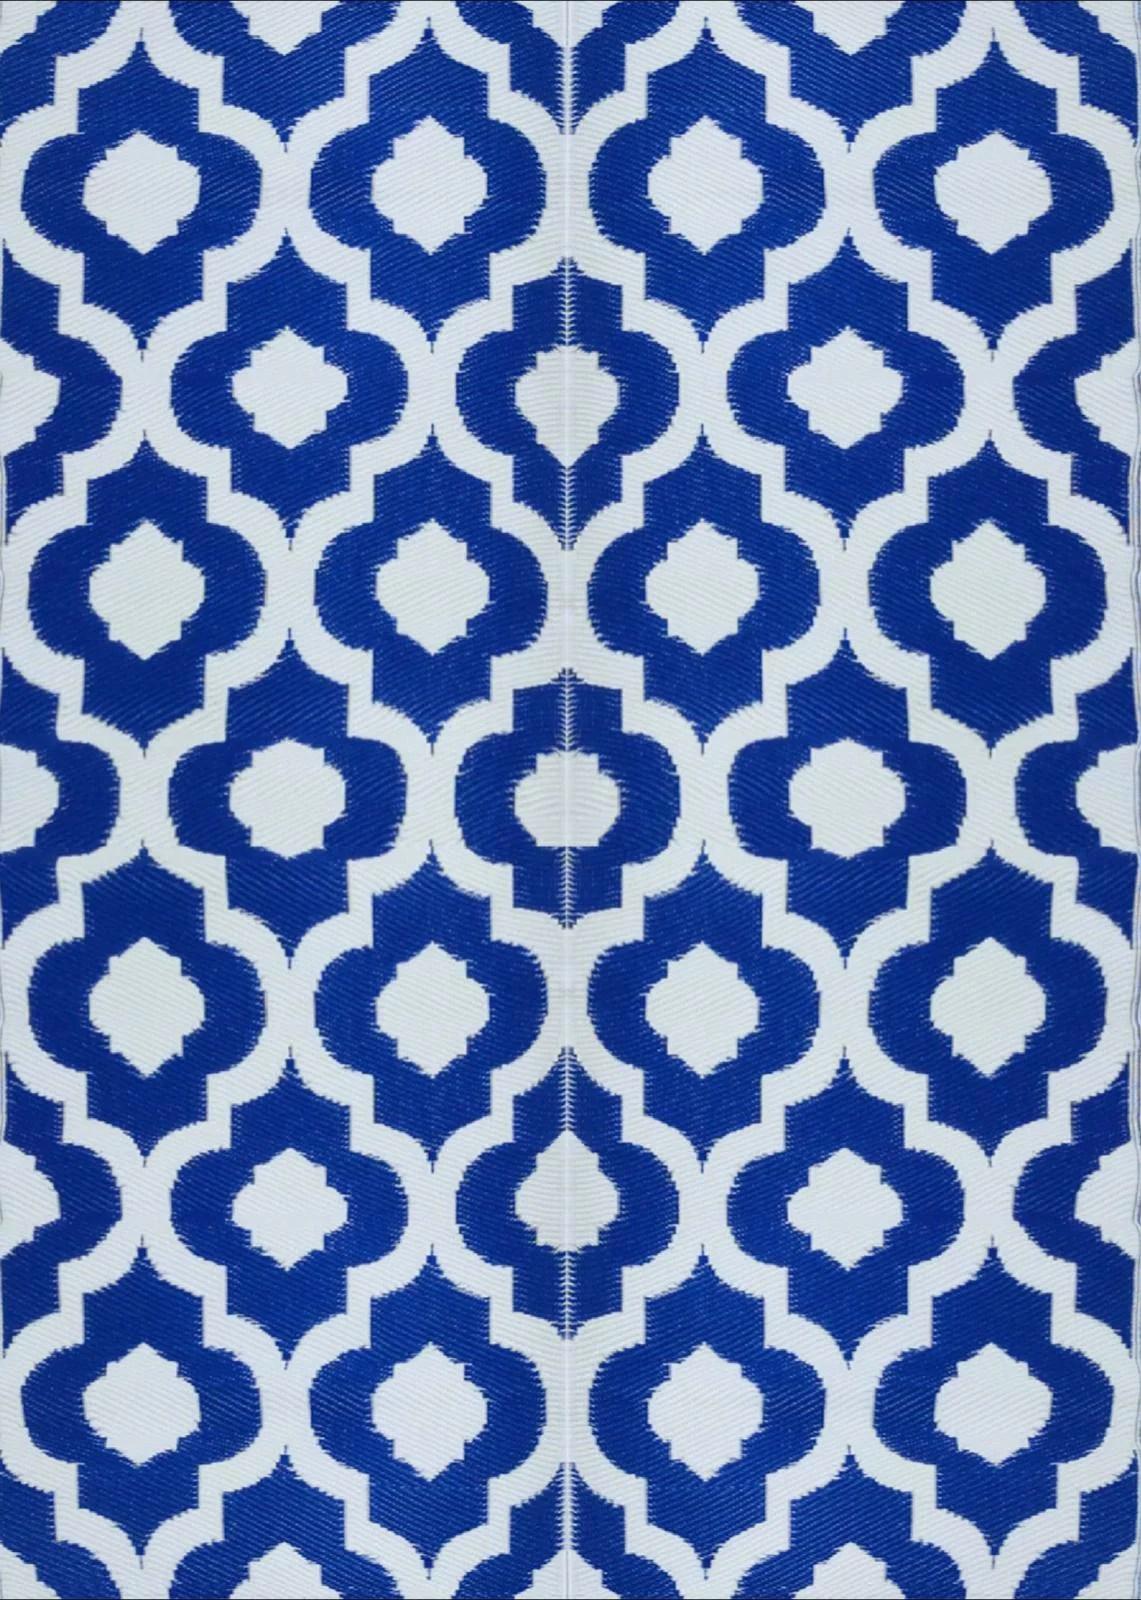 balajeesusa 2 pack 5 x7 indoor outdoor plastic straw patio rugs rv camping rug reversible mat wholesale price dark nv blue 4491